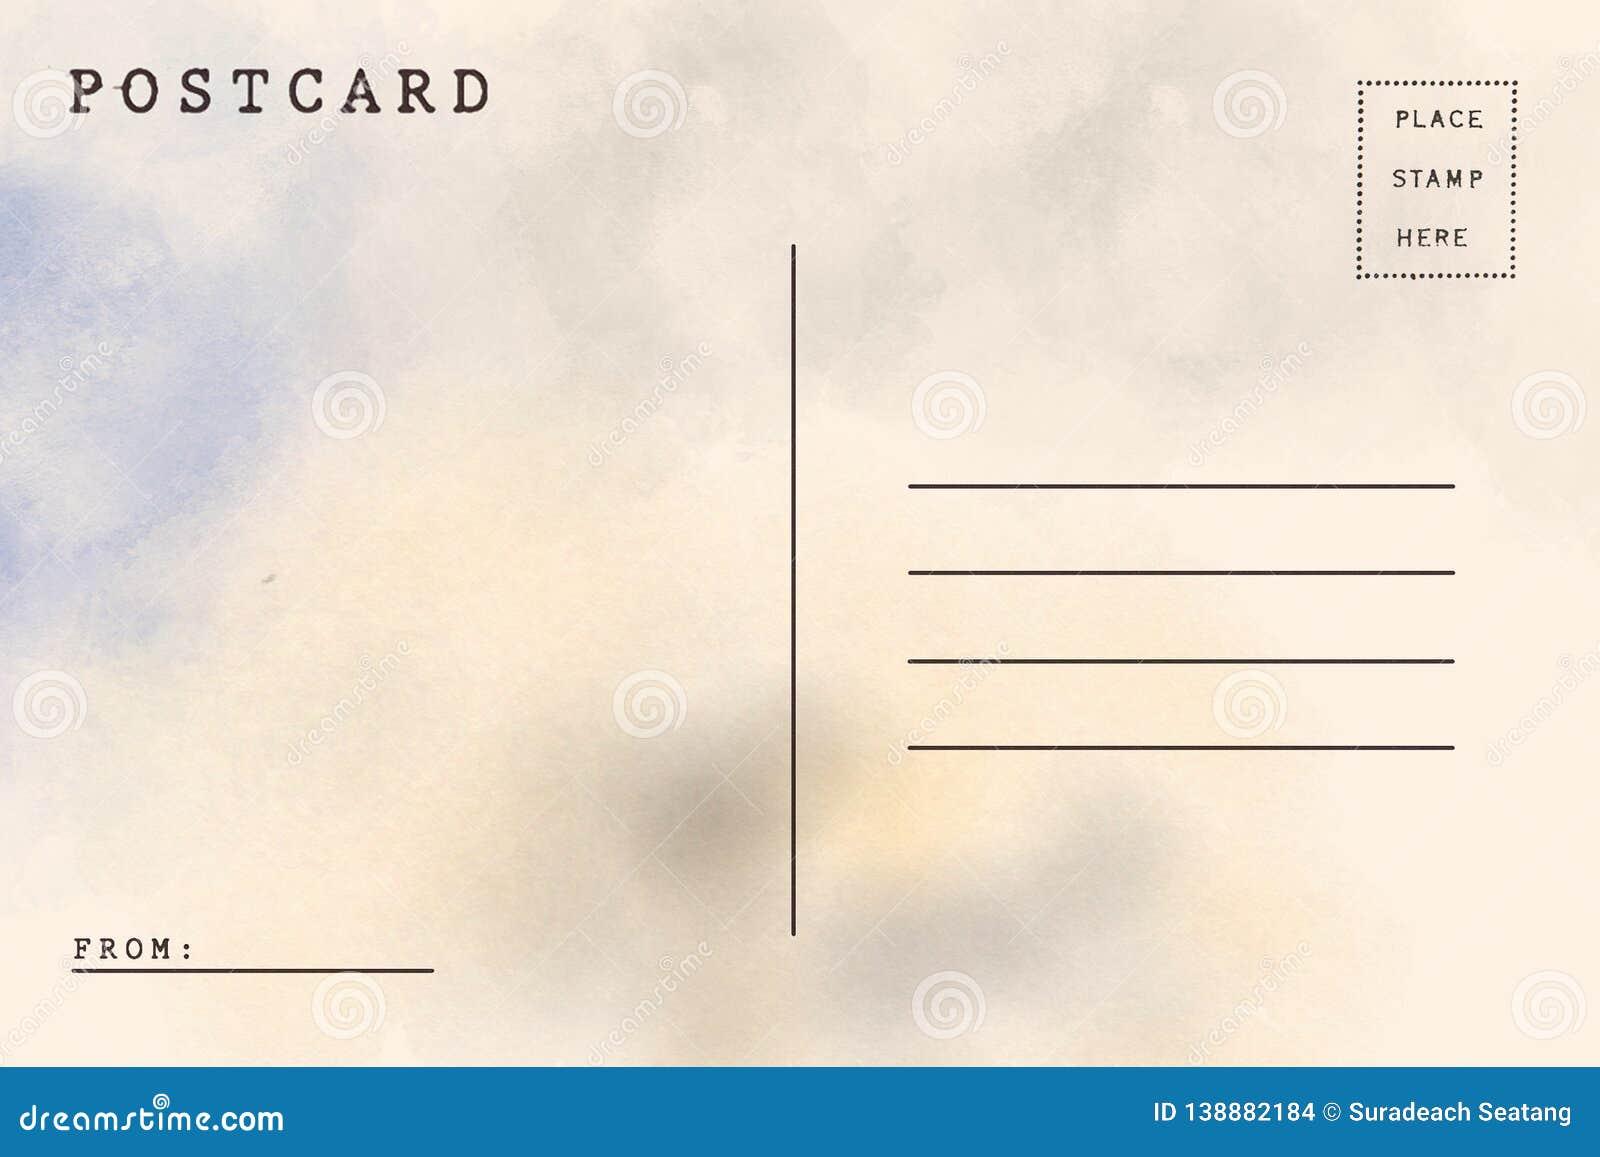 Backside of blank postcard